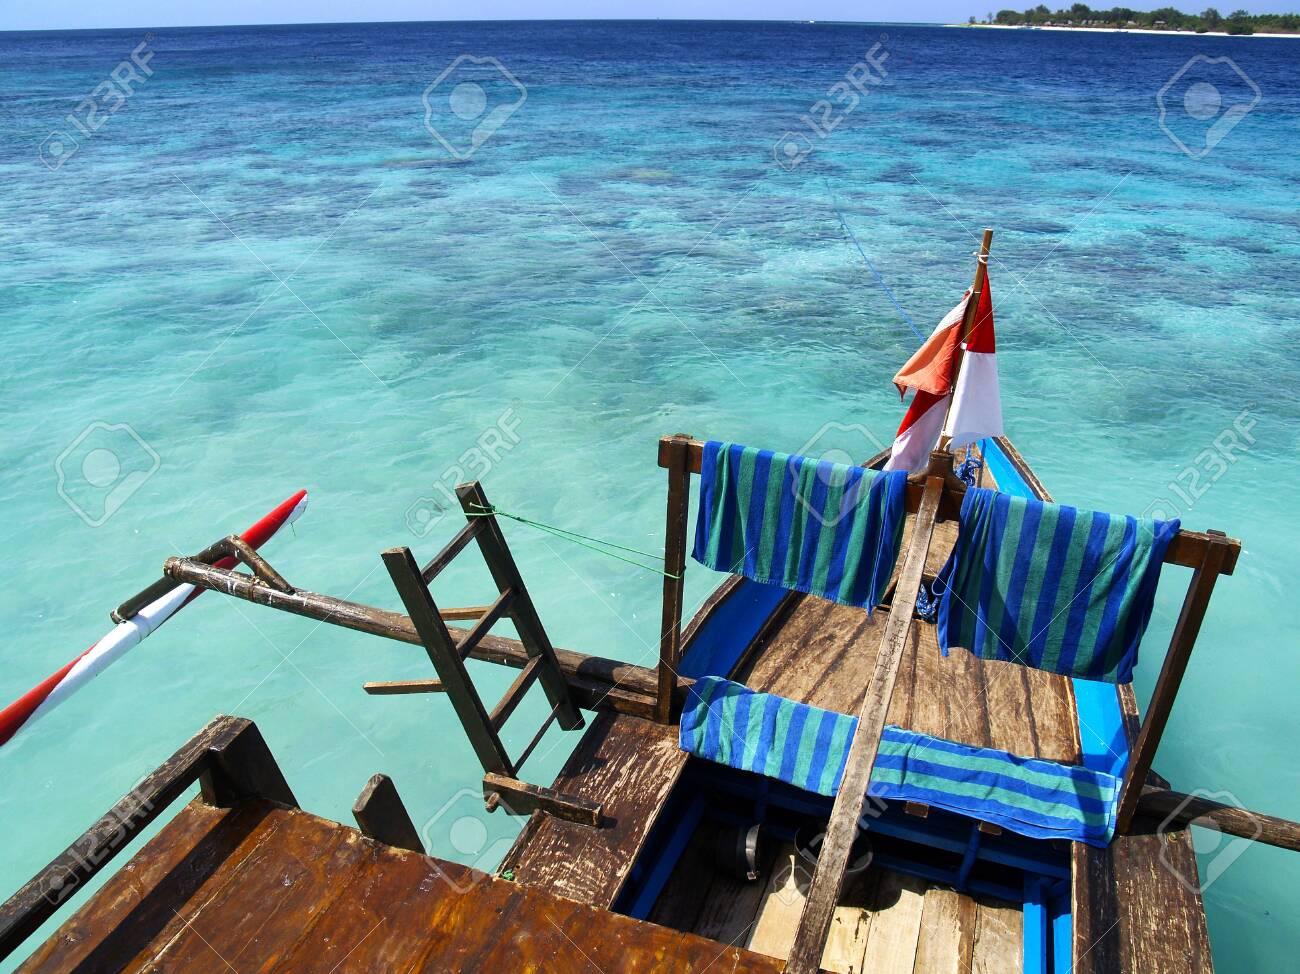 balinese boat on white sand beach - 130467065